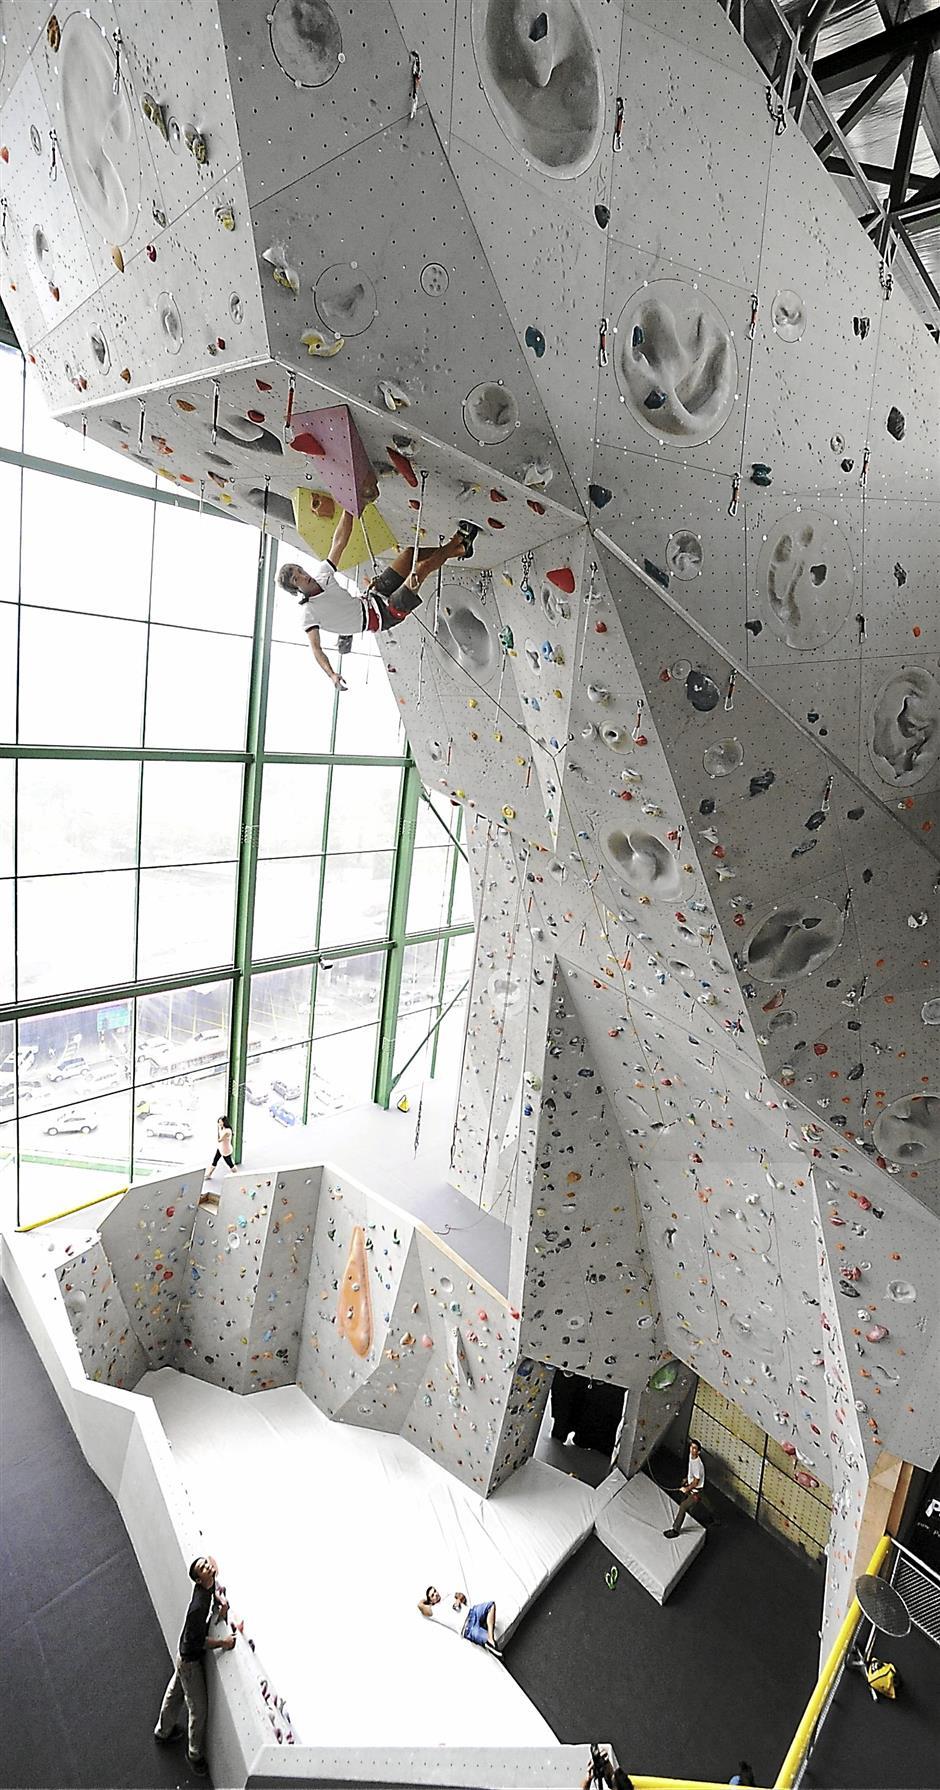 Chris Sharma tackling some super- tough sections of the climbing wall at Camp5.